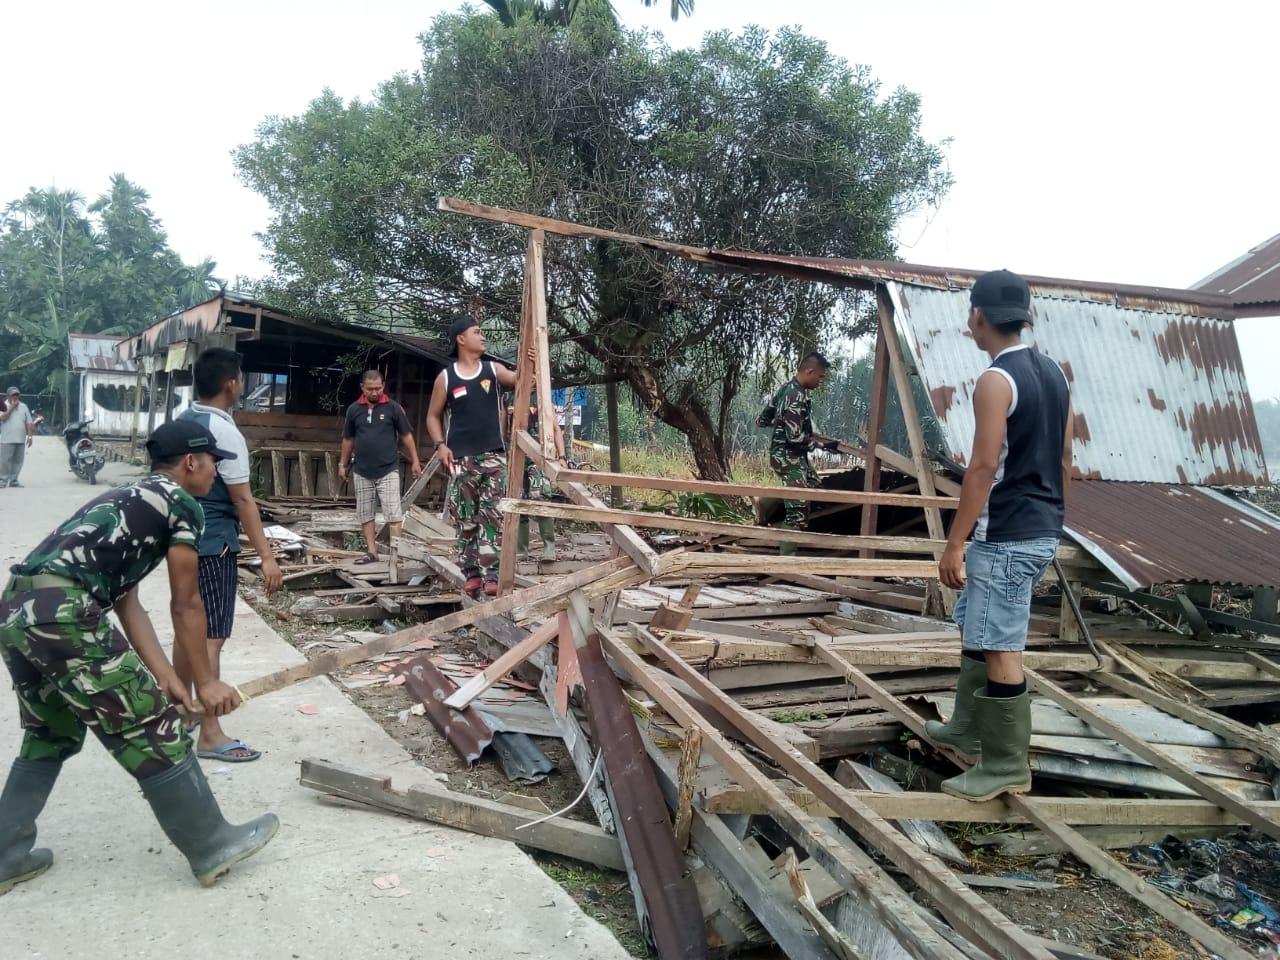 Bersama Masyarakat, Satgas TMMD Kodim 0314 Inhil Bersihkan Pasar